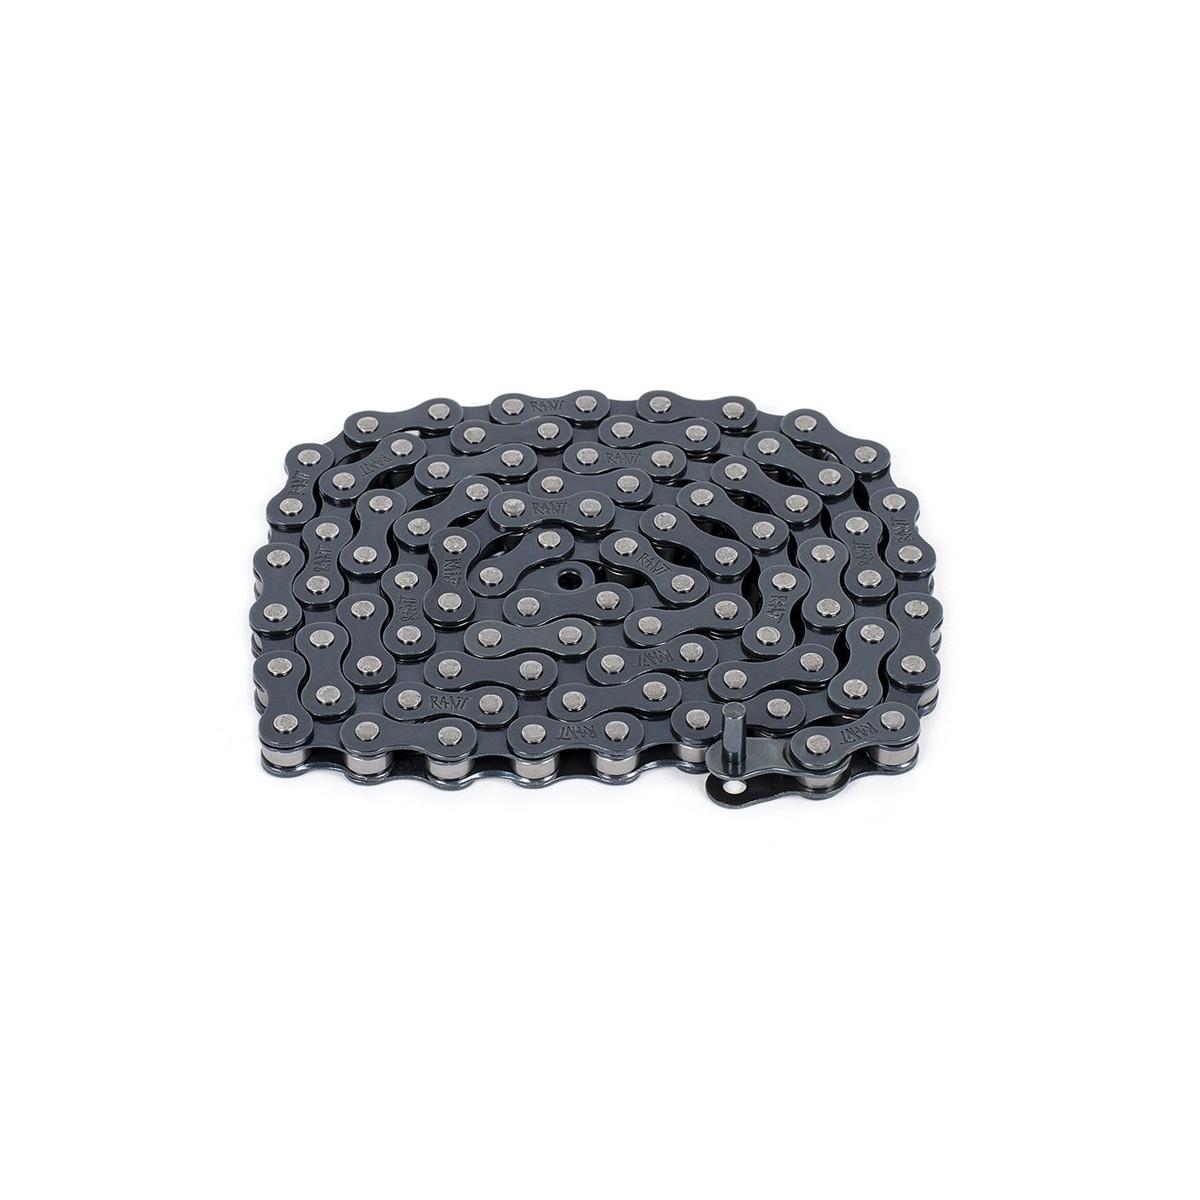 Chaîne BMX Rant Max 410 Chain 1/8\